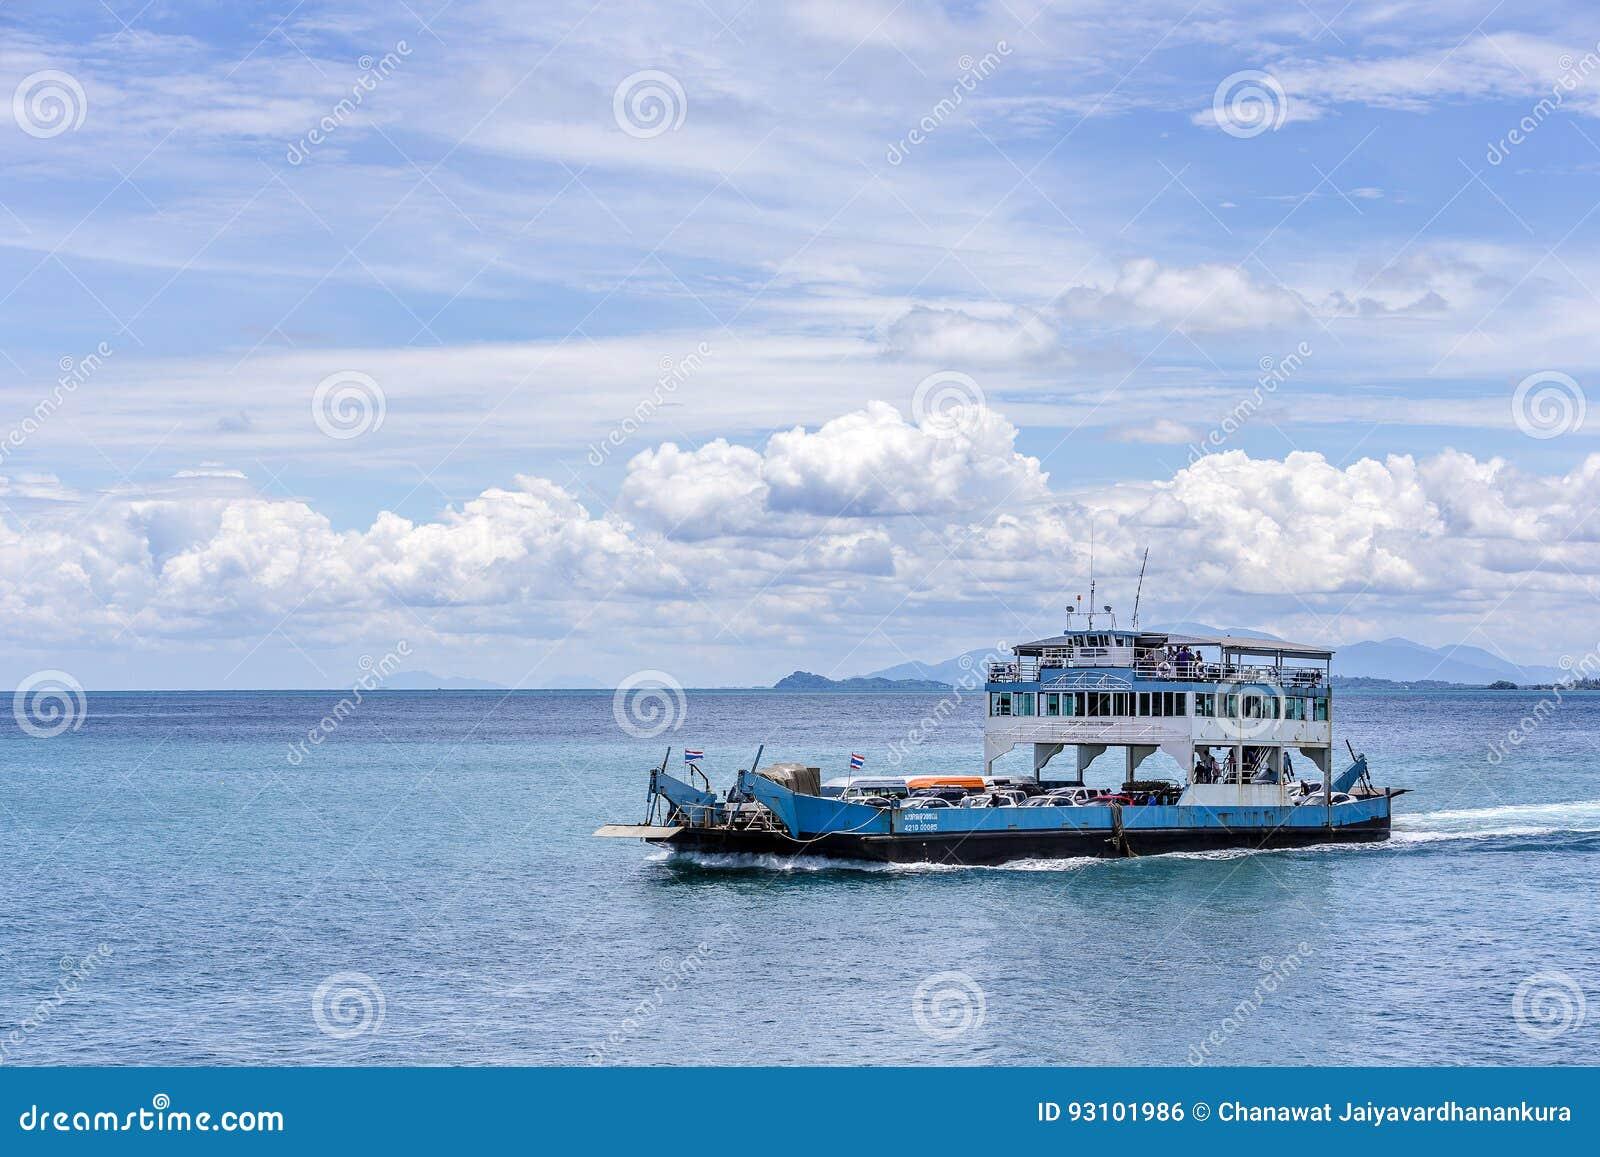 El transbordador que llega a la isla de Koh Chang del continente